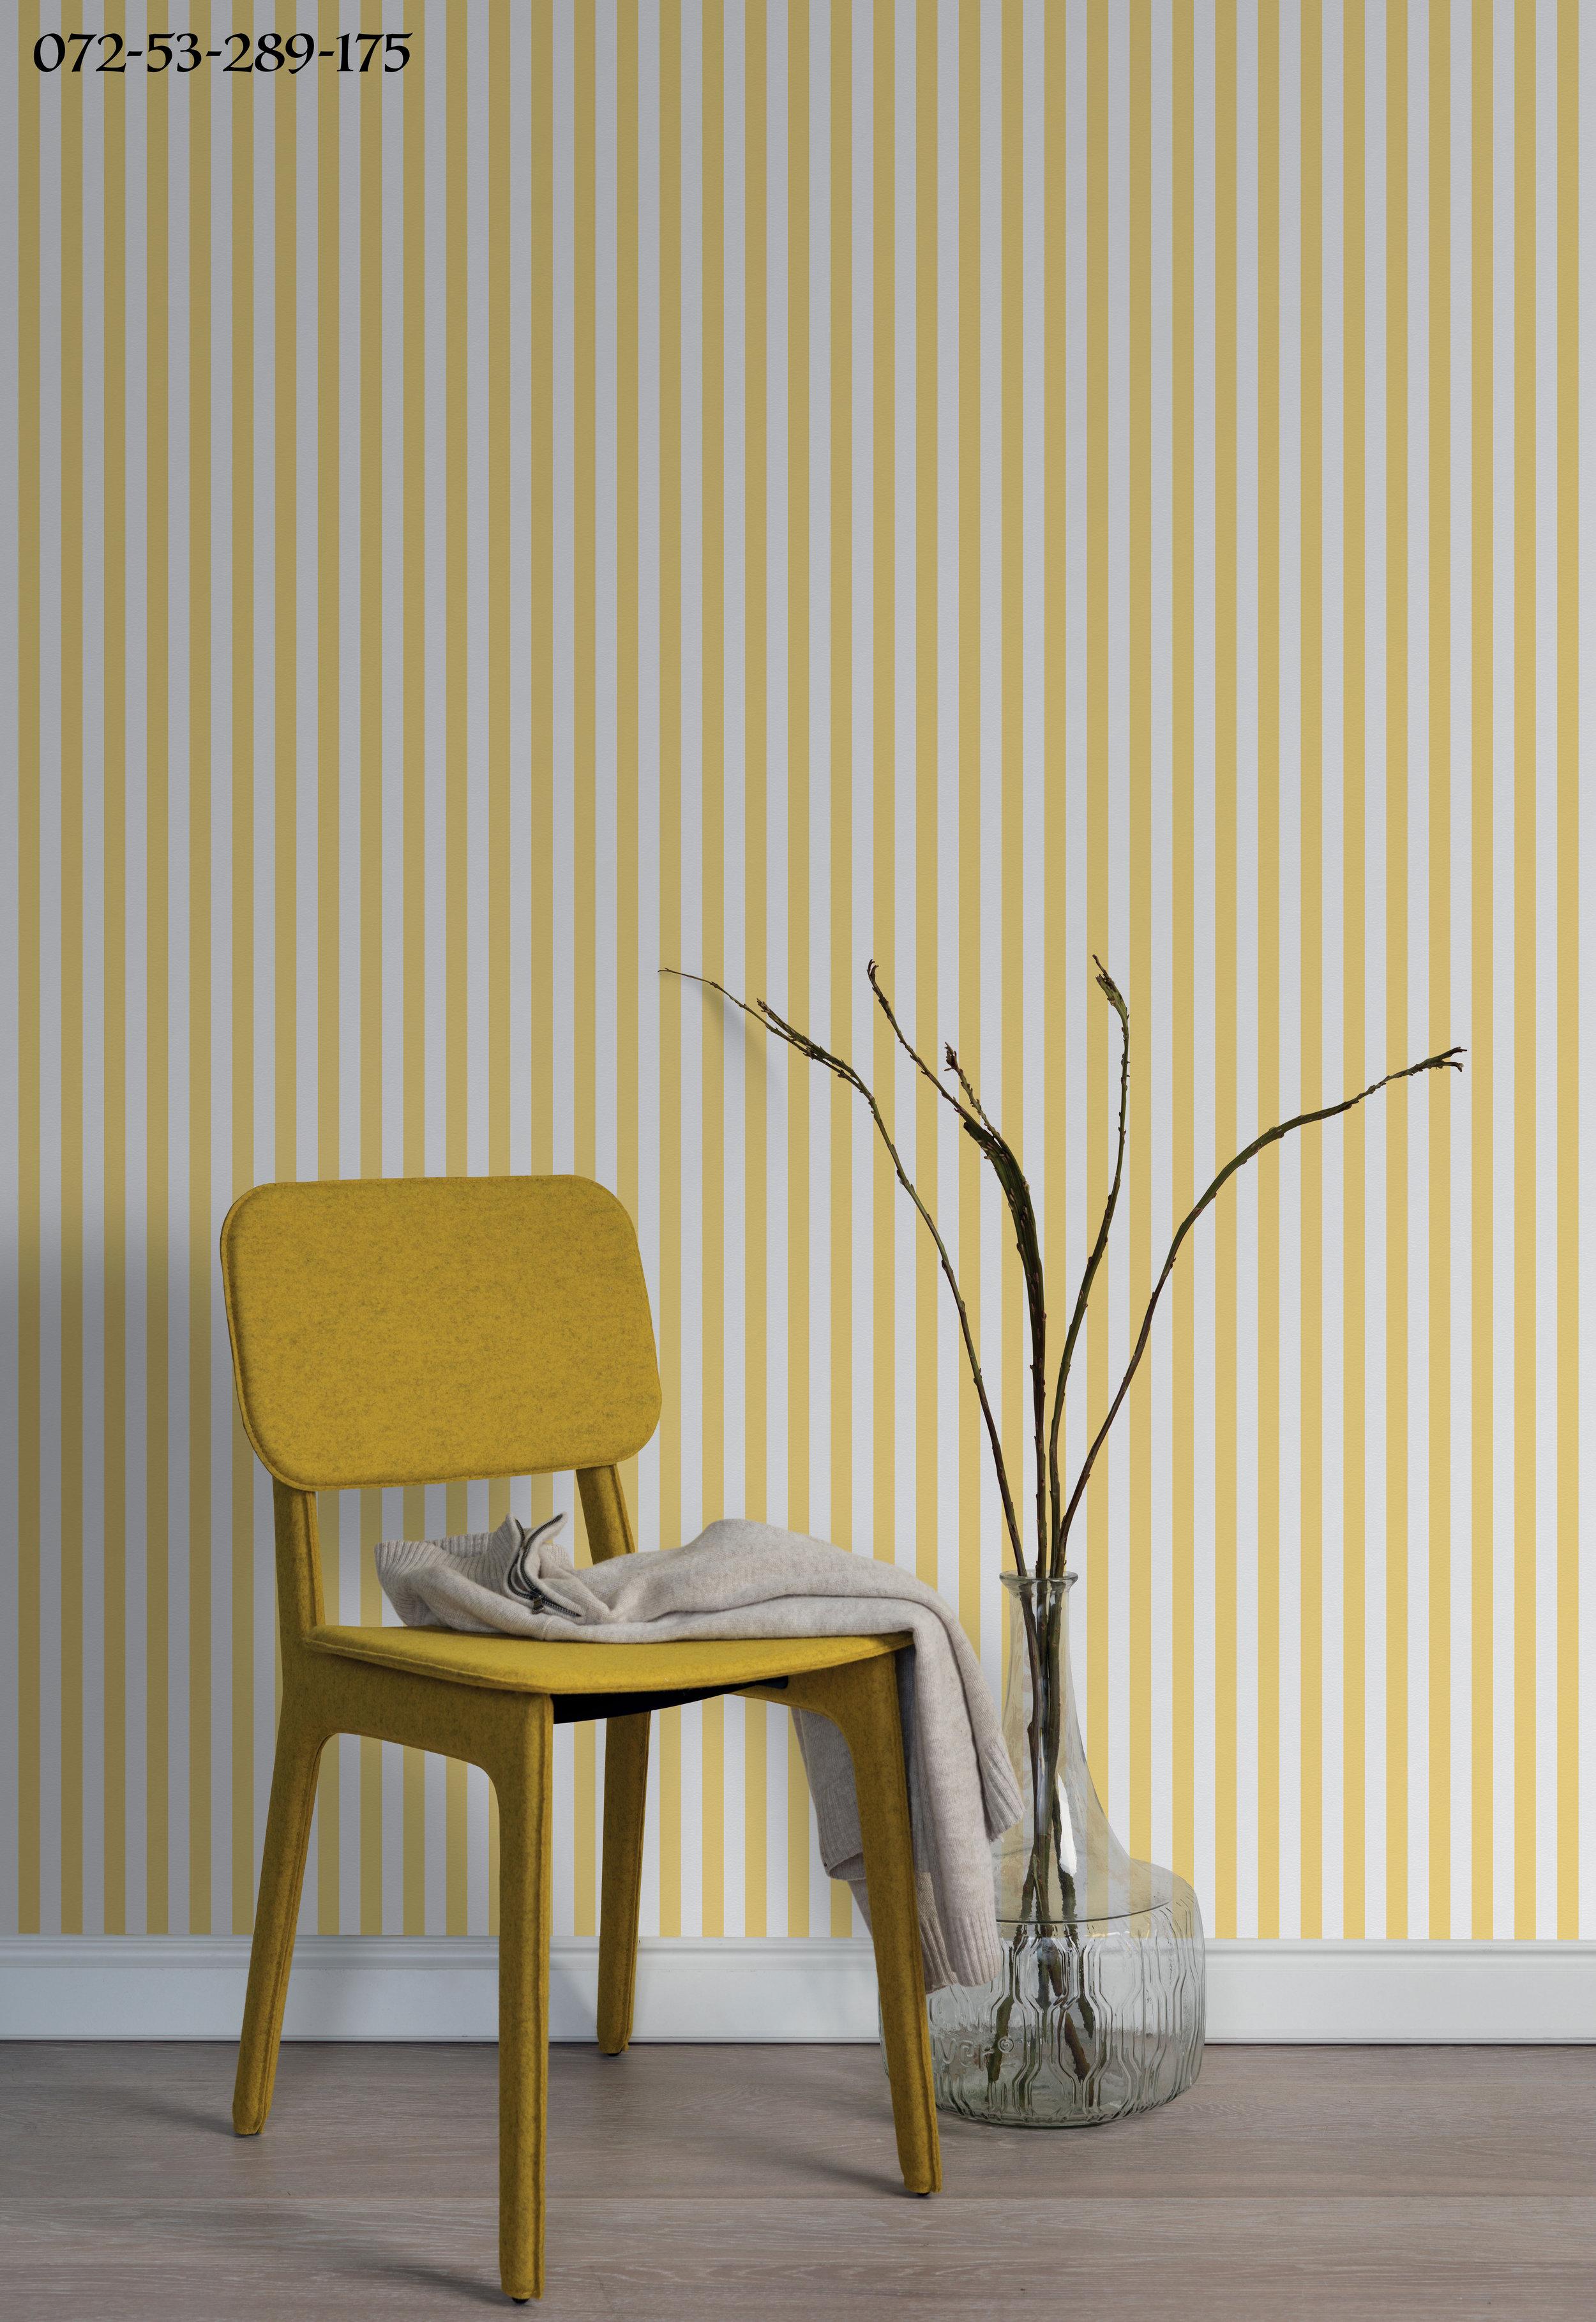 D_53-289175_Petite Fleur4a.jpg